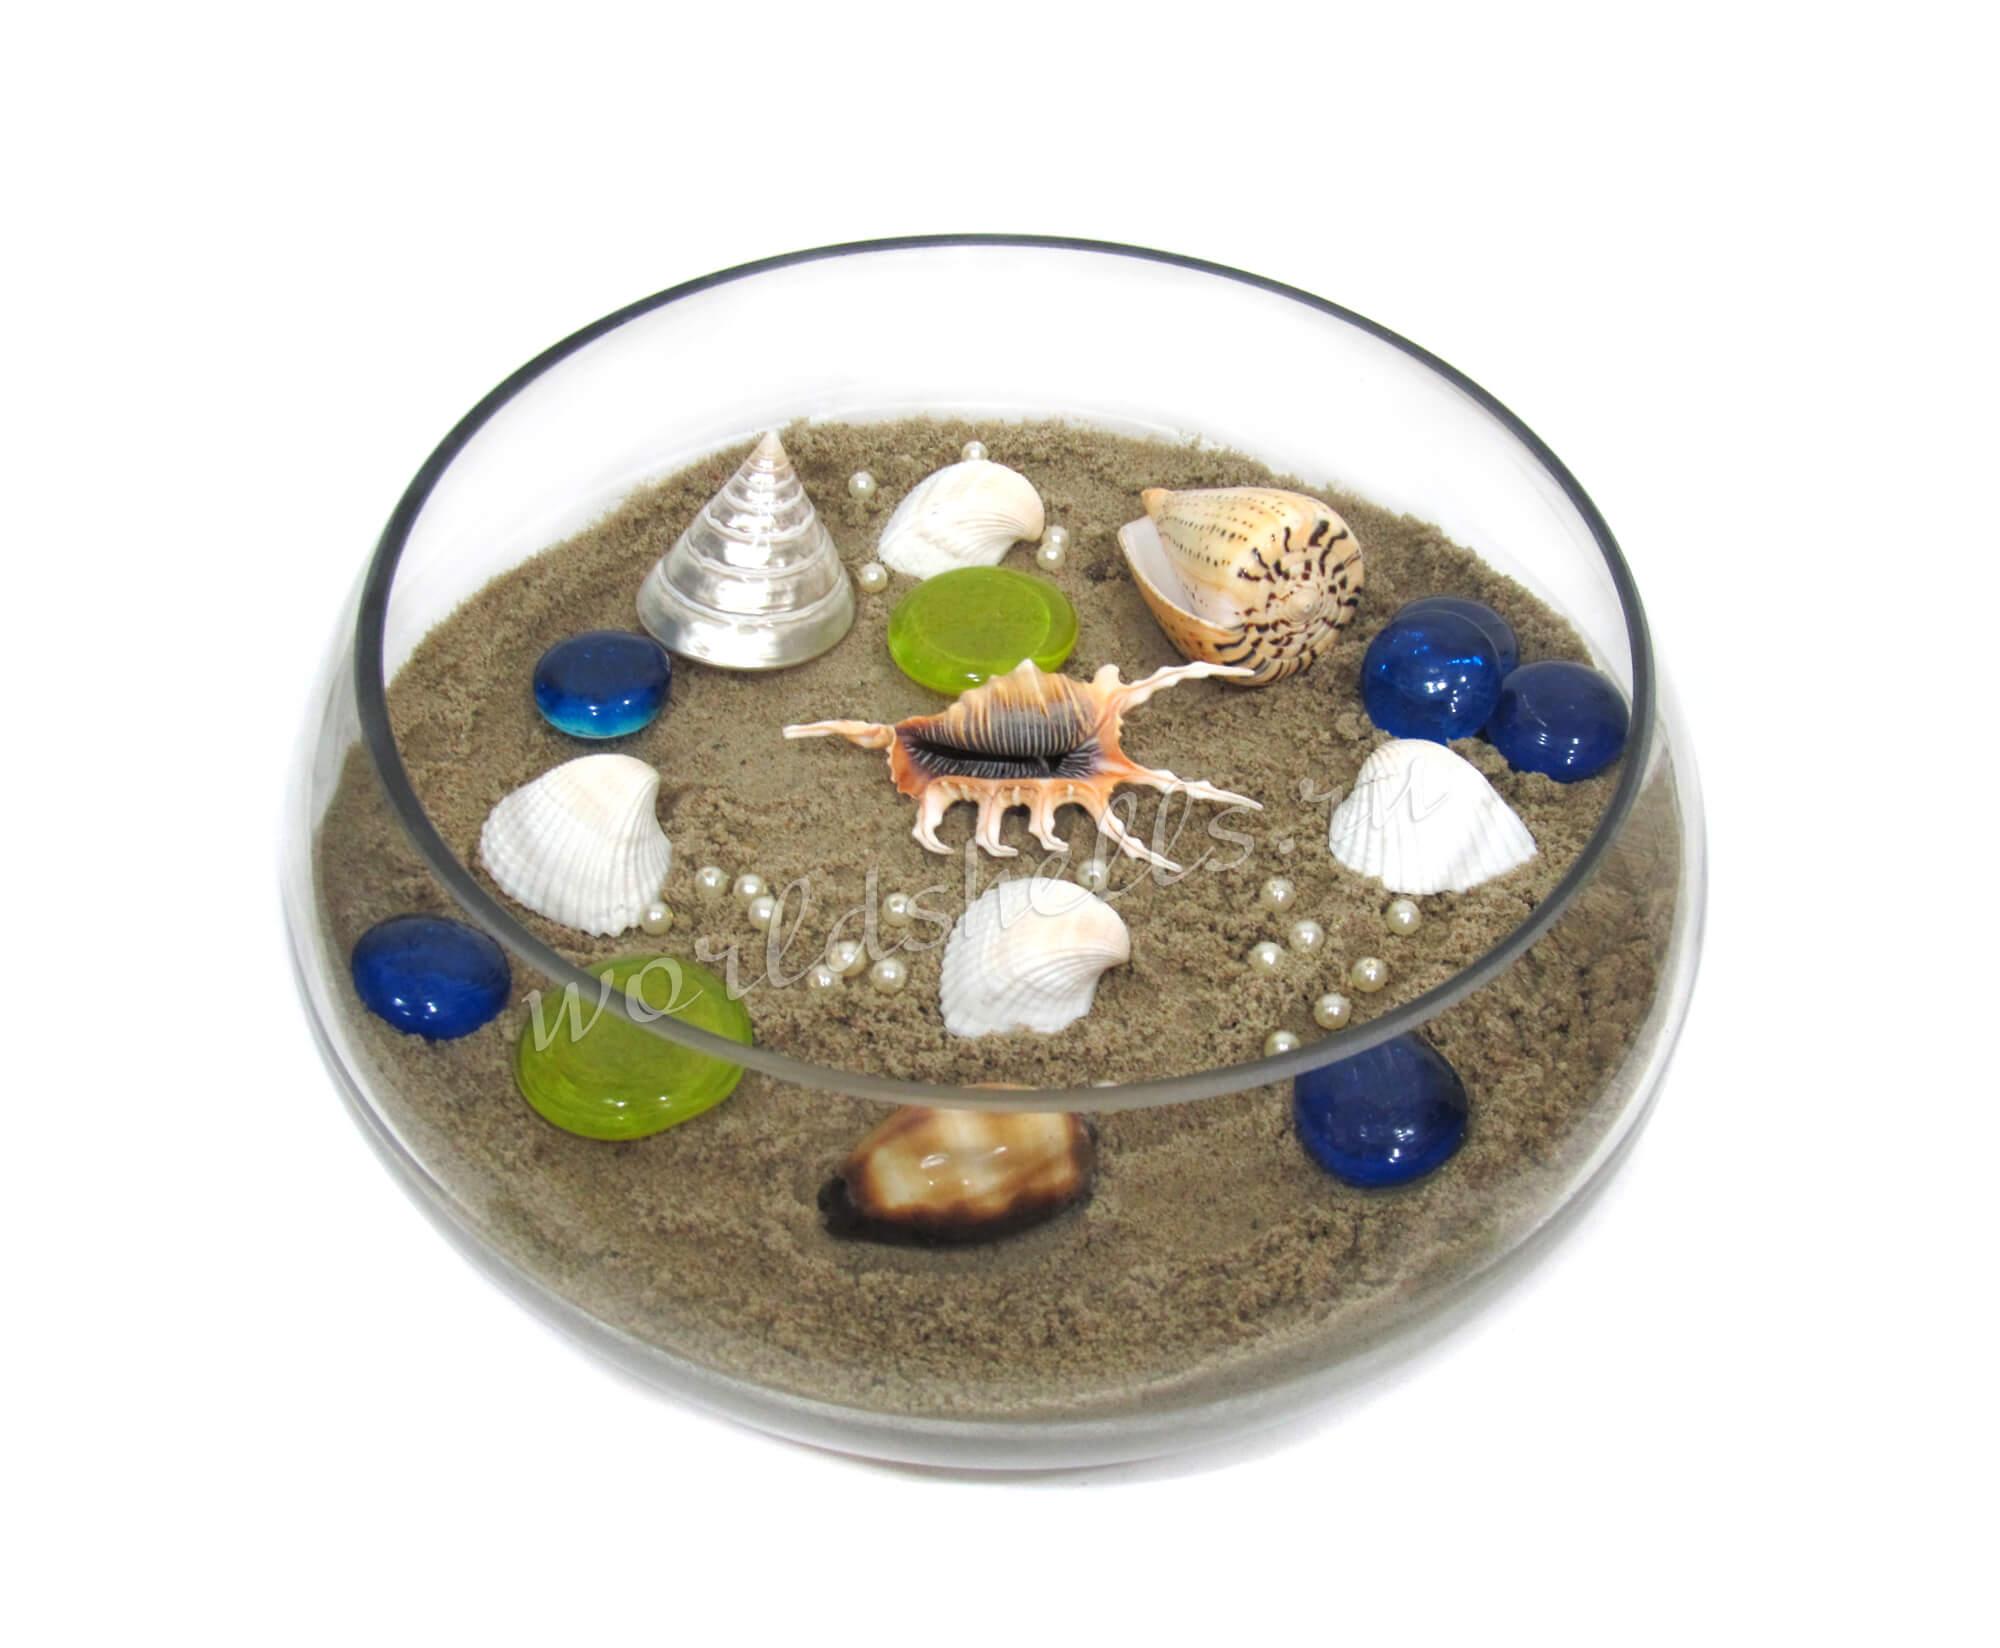 Композиция с песком и морскими ракушками